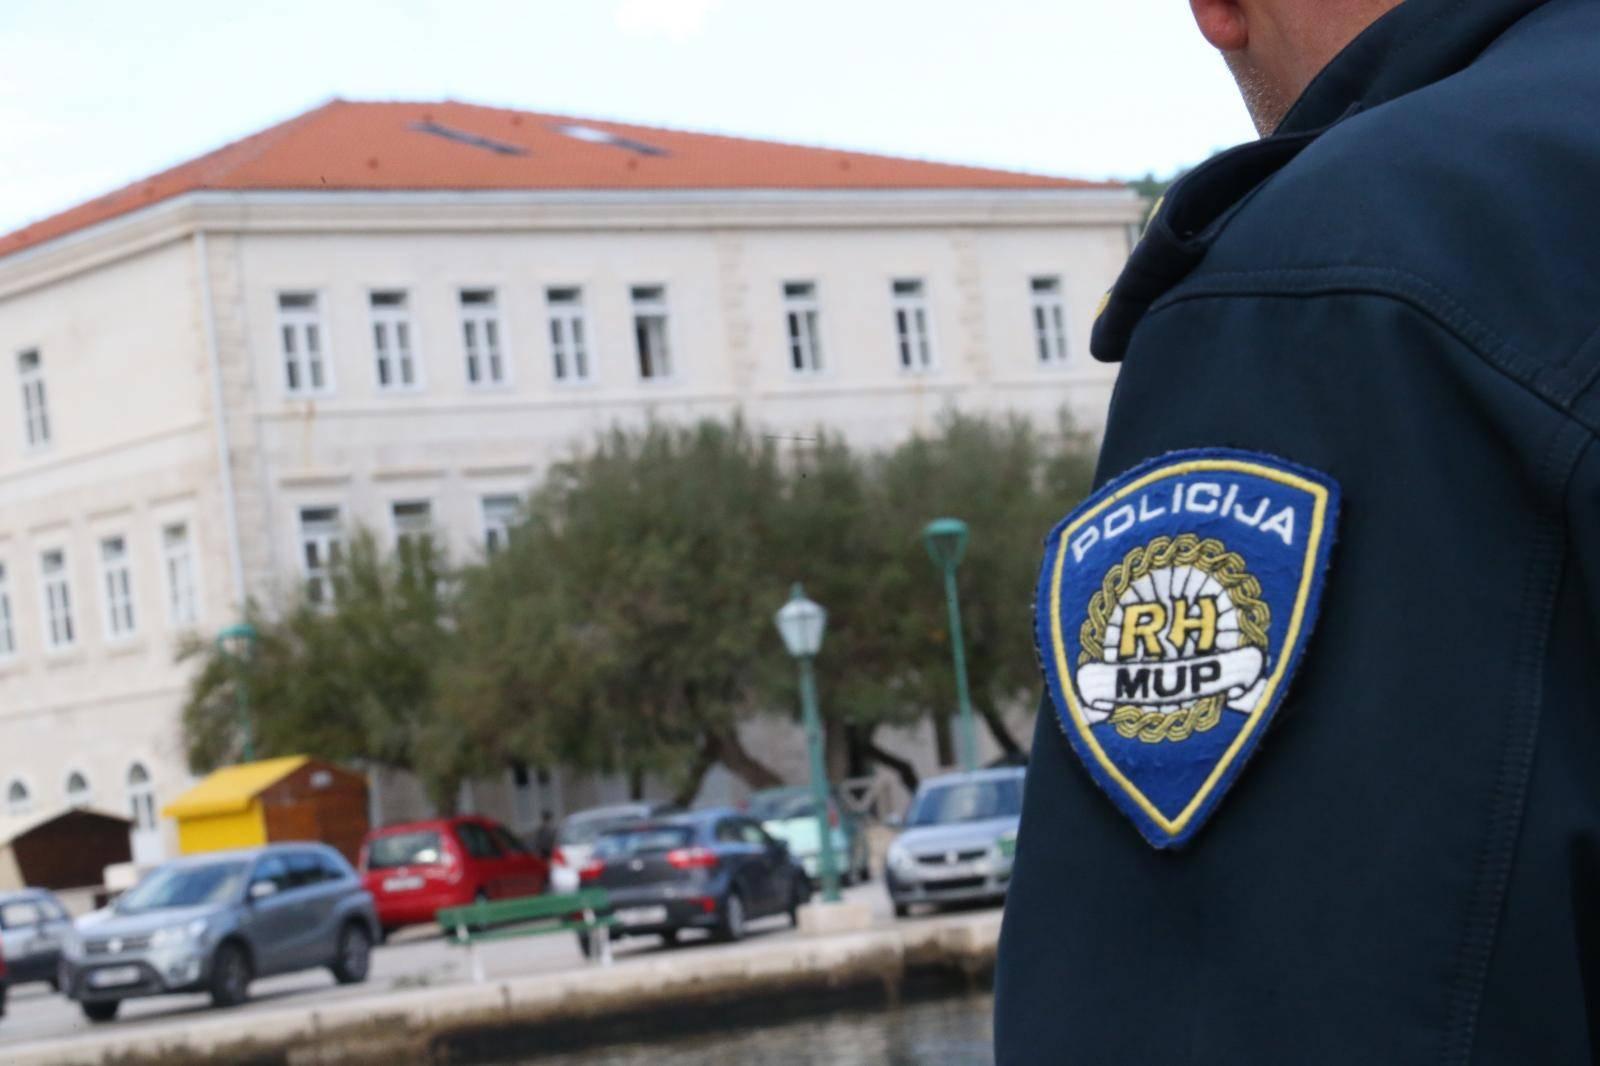 Trojka iz RSK optuženi su za ratni zločin protiv Hrvata